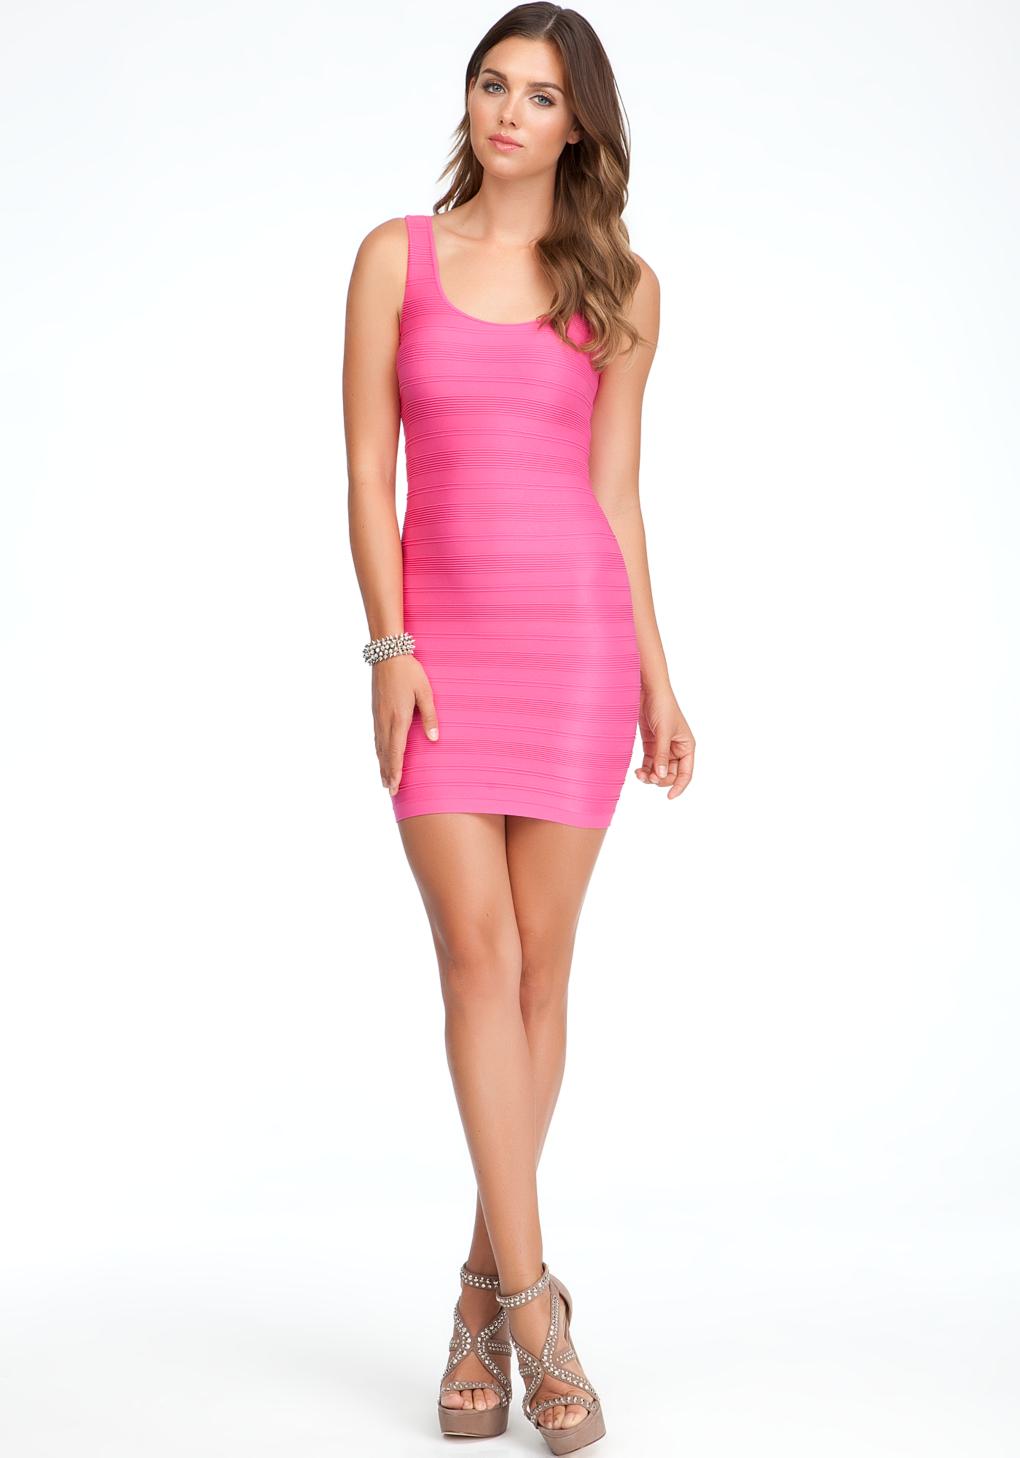 Bebe Haley Shine Bodycon Dress in Pink